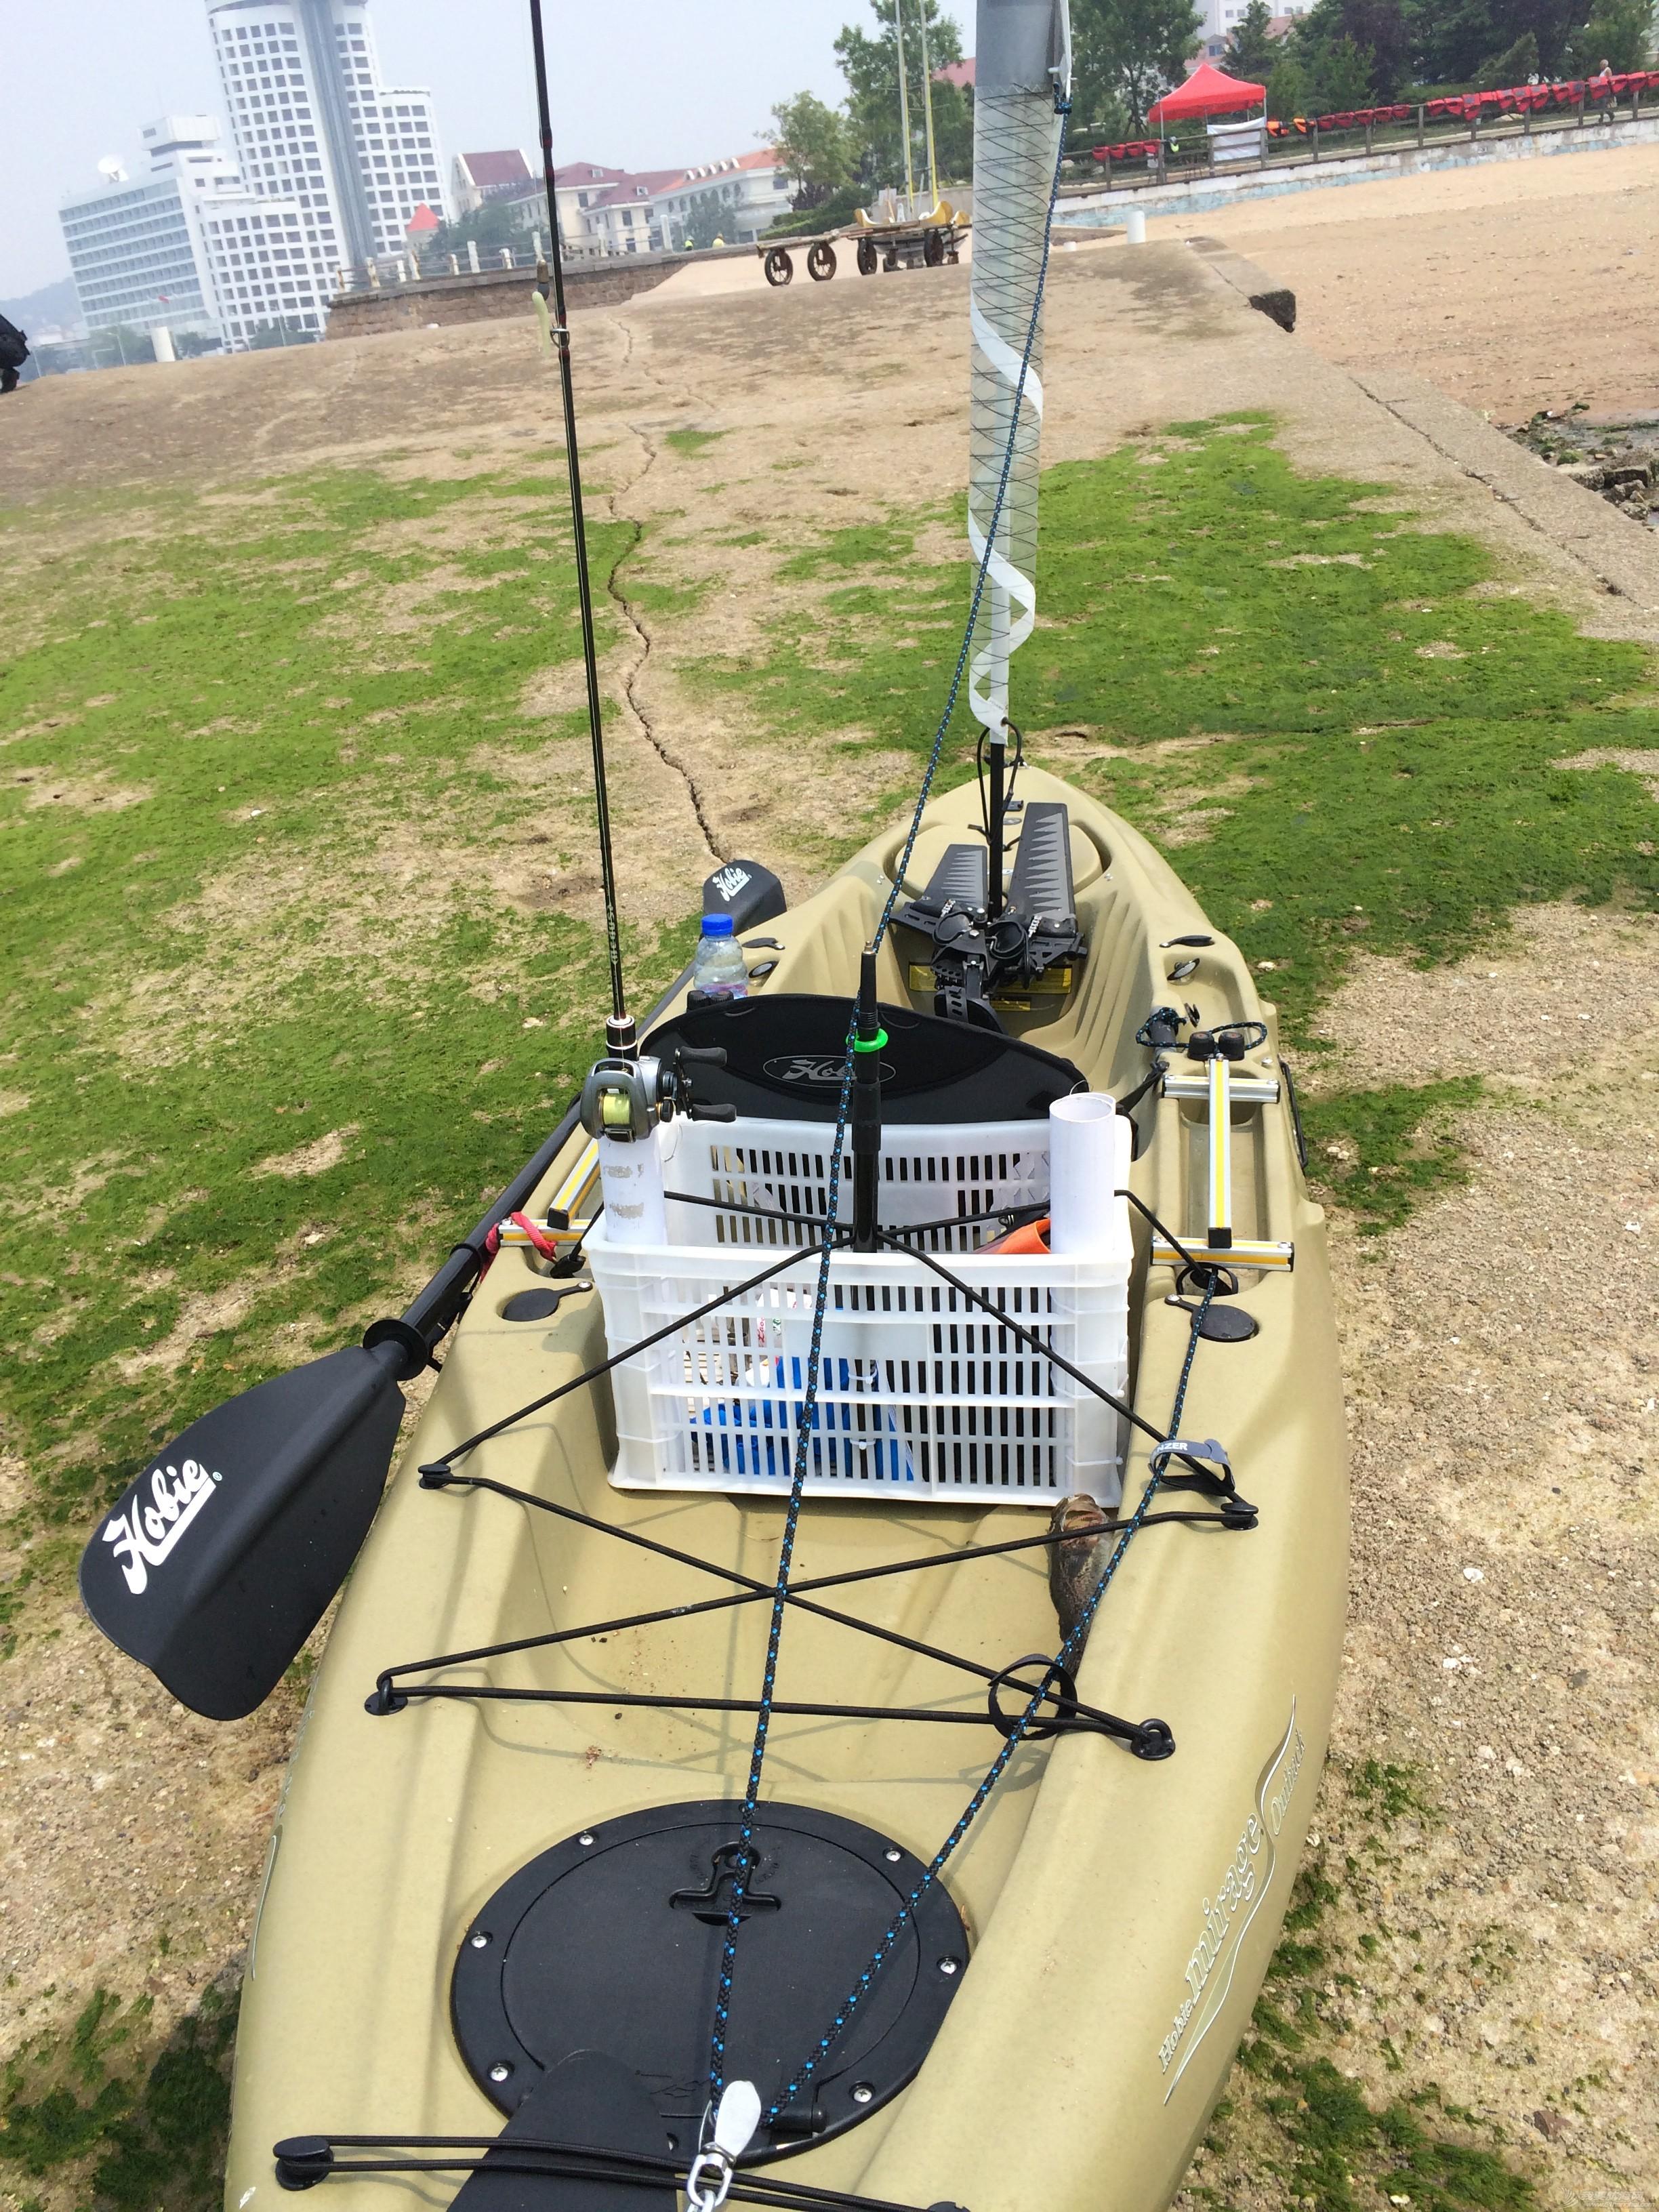 nbsp,原厂,系统,风帆,所以 hobie outback皮划艇 带风帆系统 青岛  001955rt2g7zmt36jiza4x